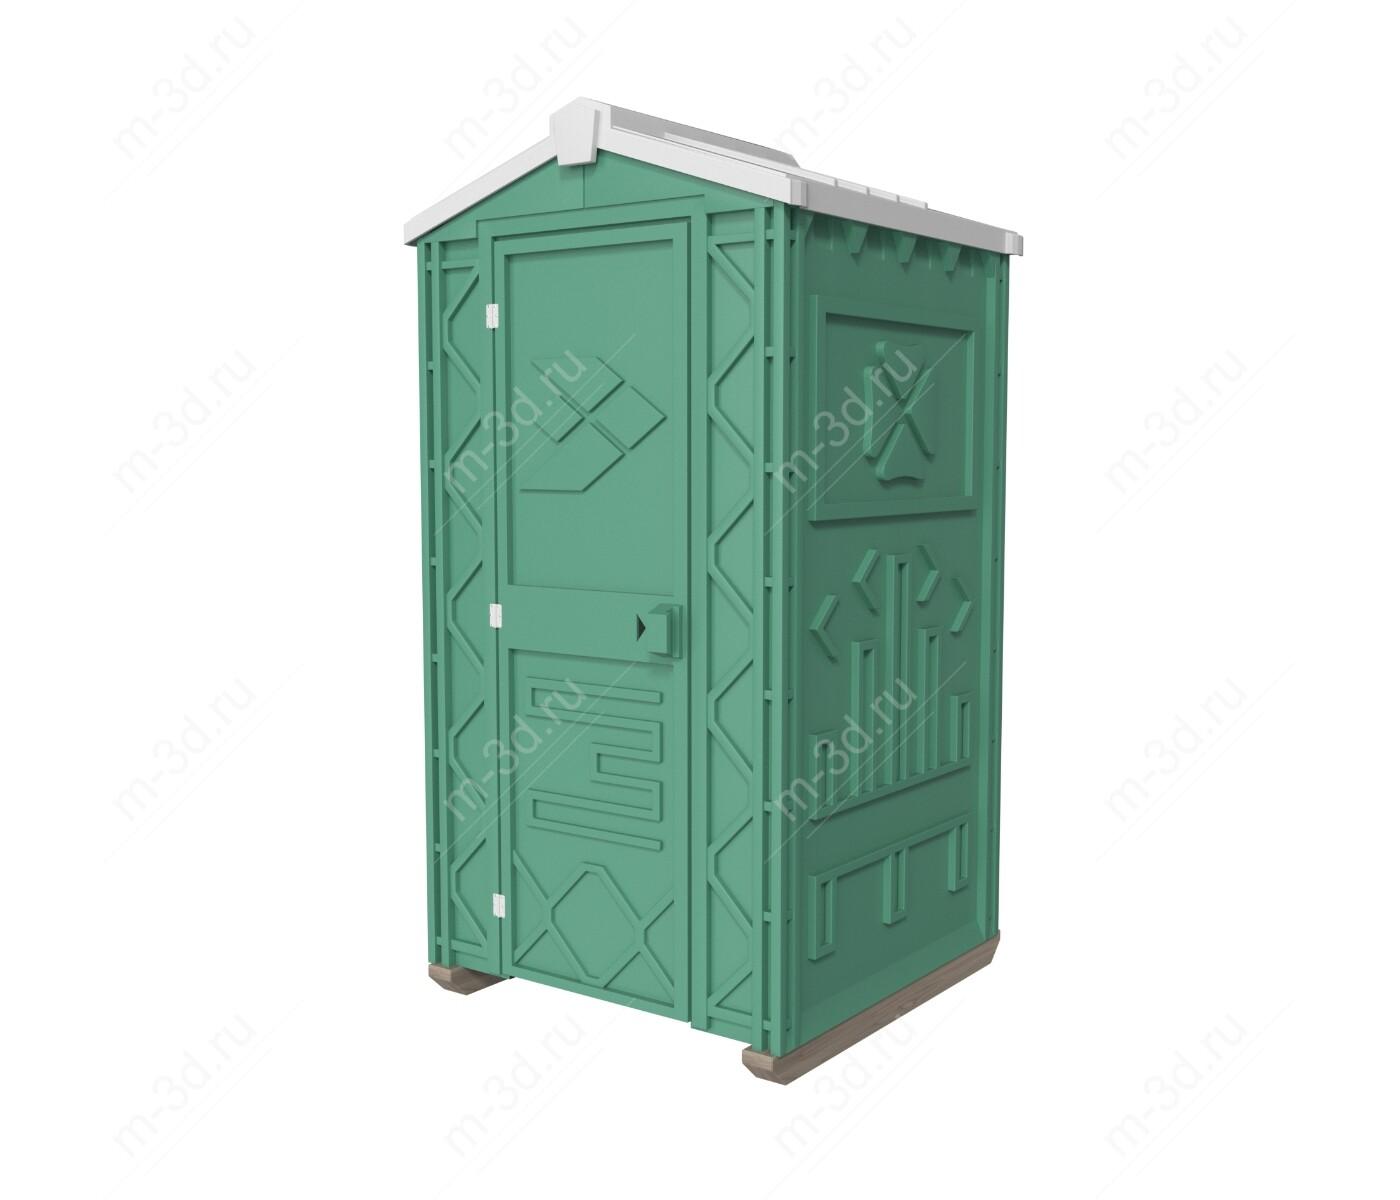 кабинка туалета пластиковая